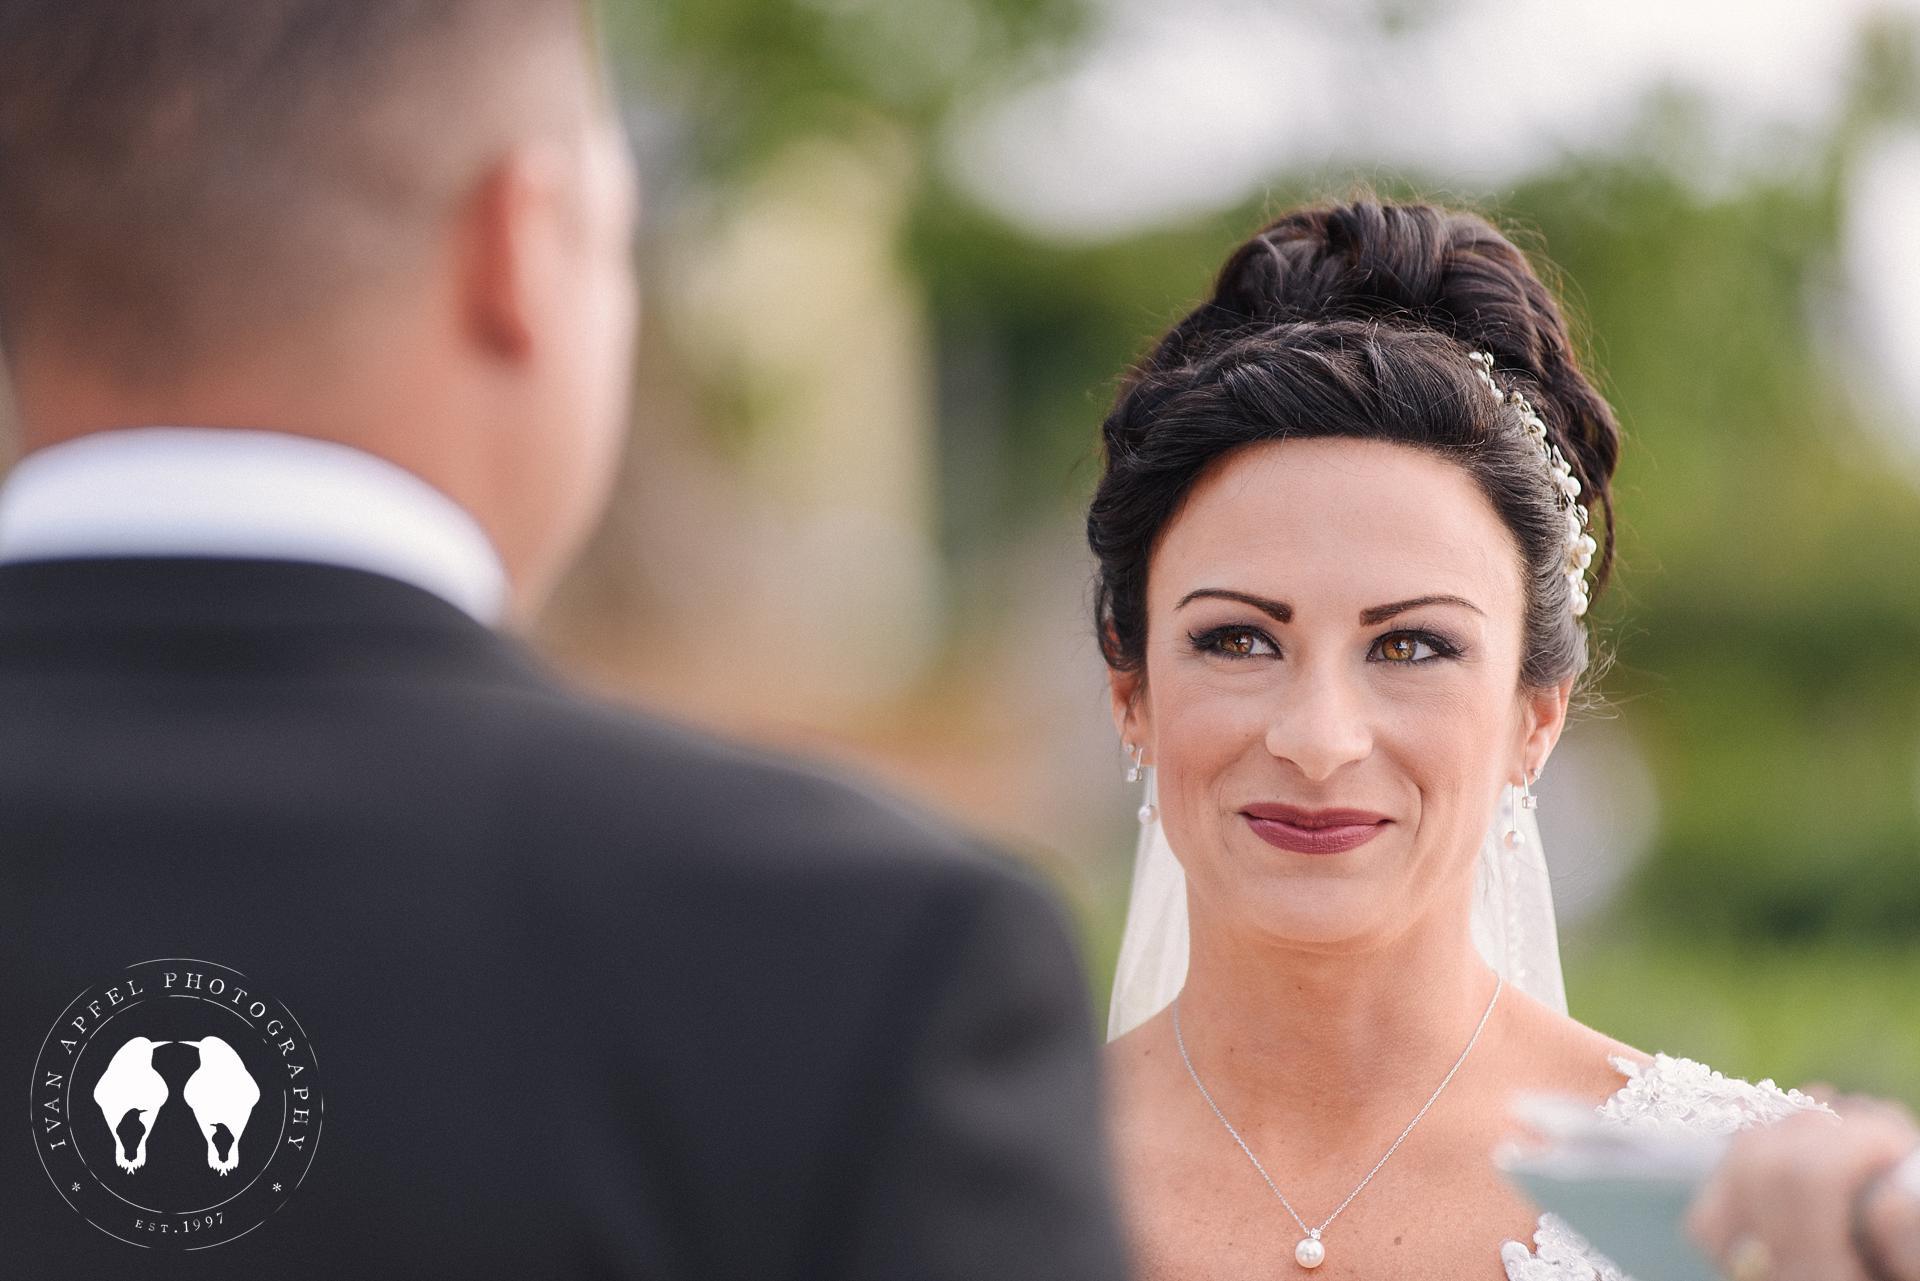 Islamorada-Wedding-Post-Card-Inn-EandS-Ivan-Apfel-Photography_0036-1